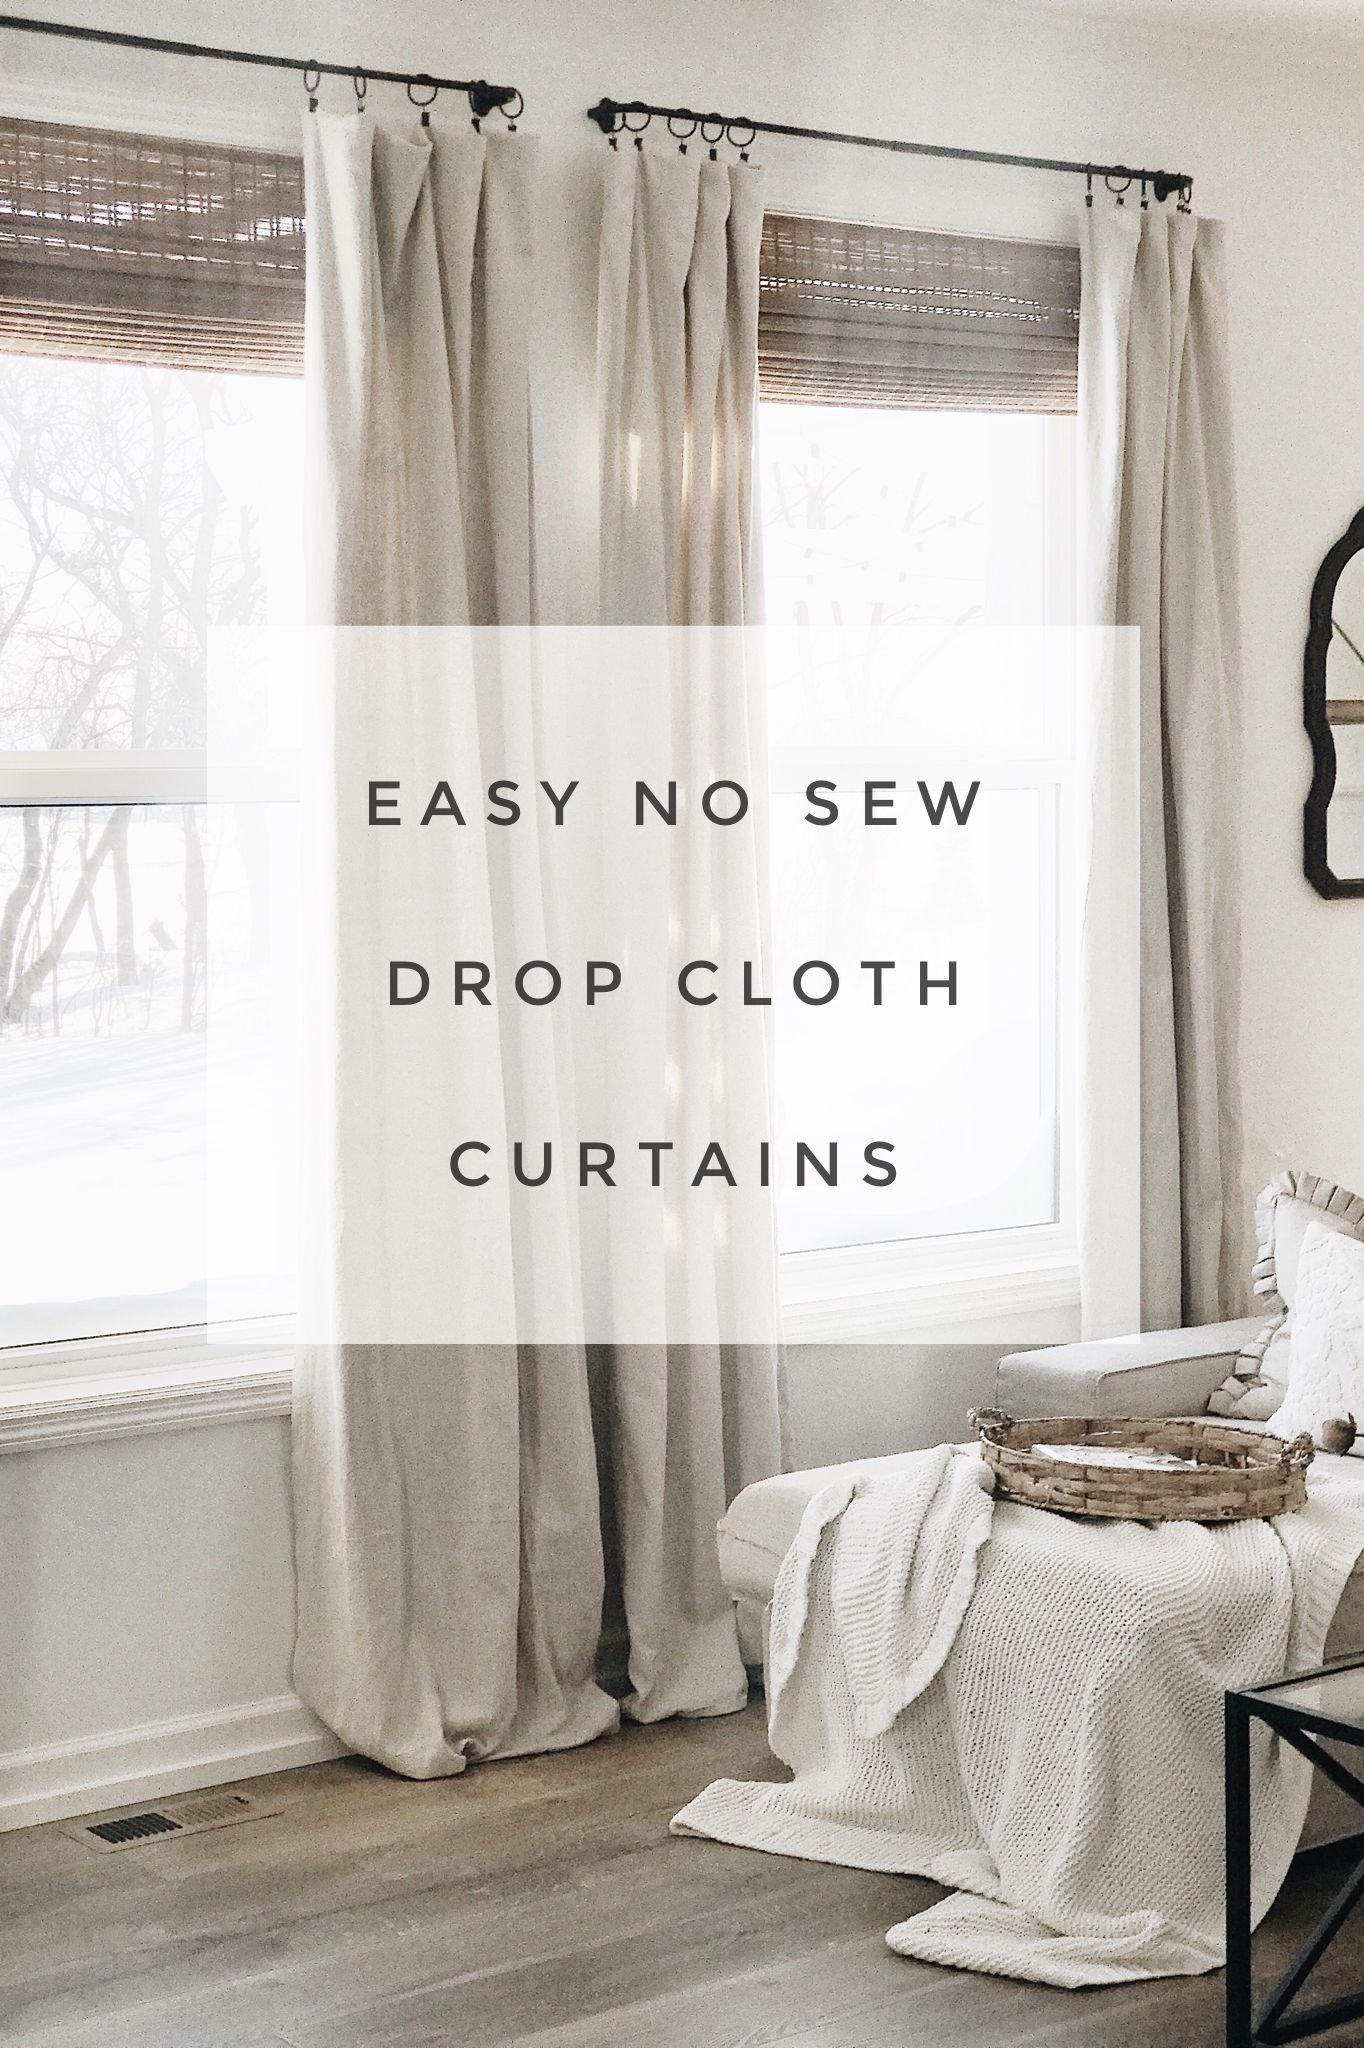 easy no sew drop cloth curtains Drop cloth curtains